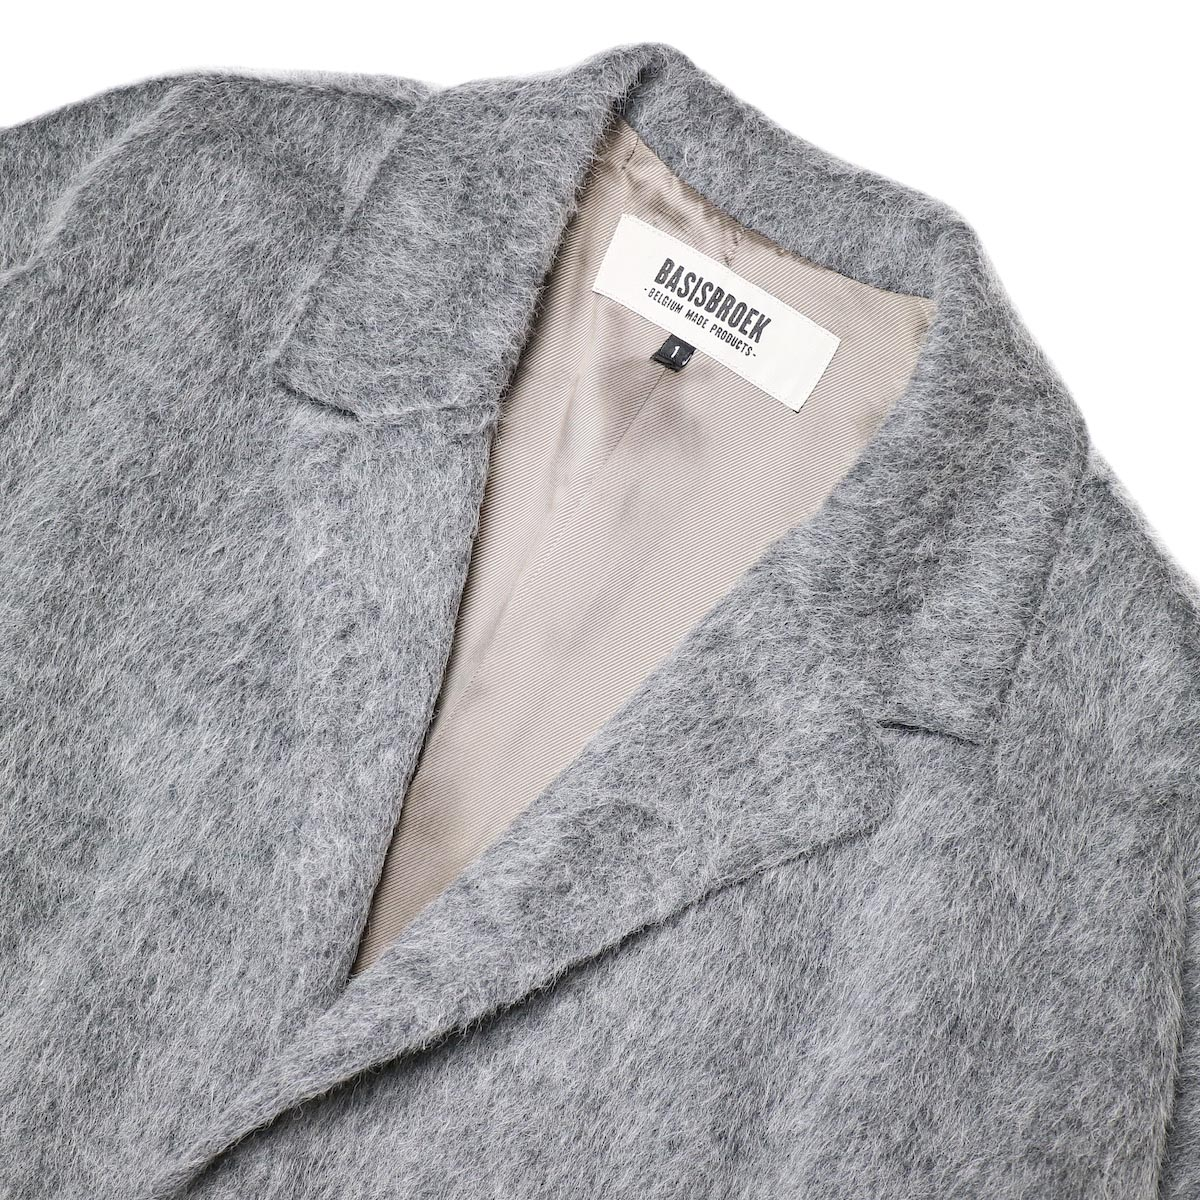 BASISBROEK / RECHT (med grey) 襟